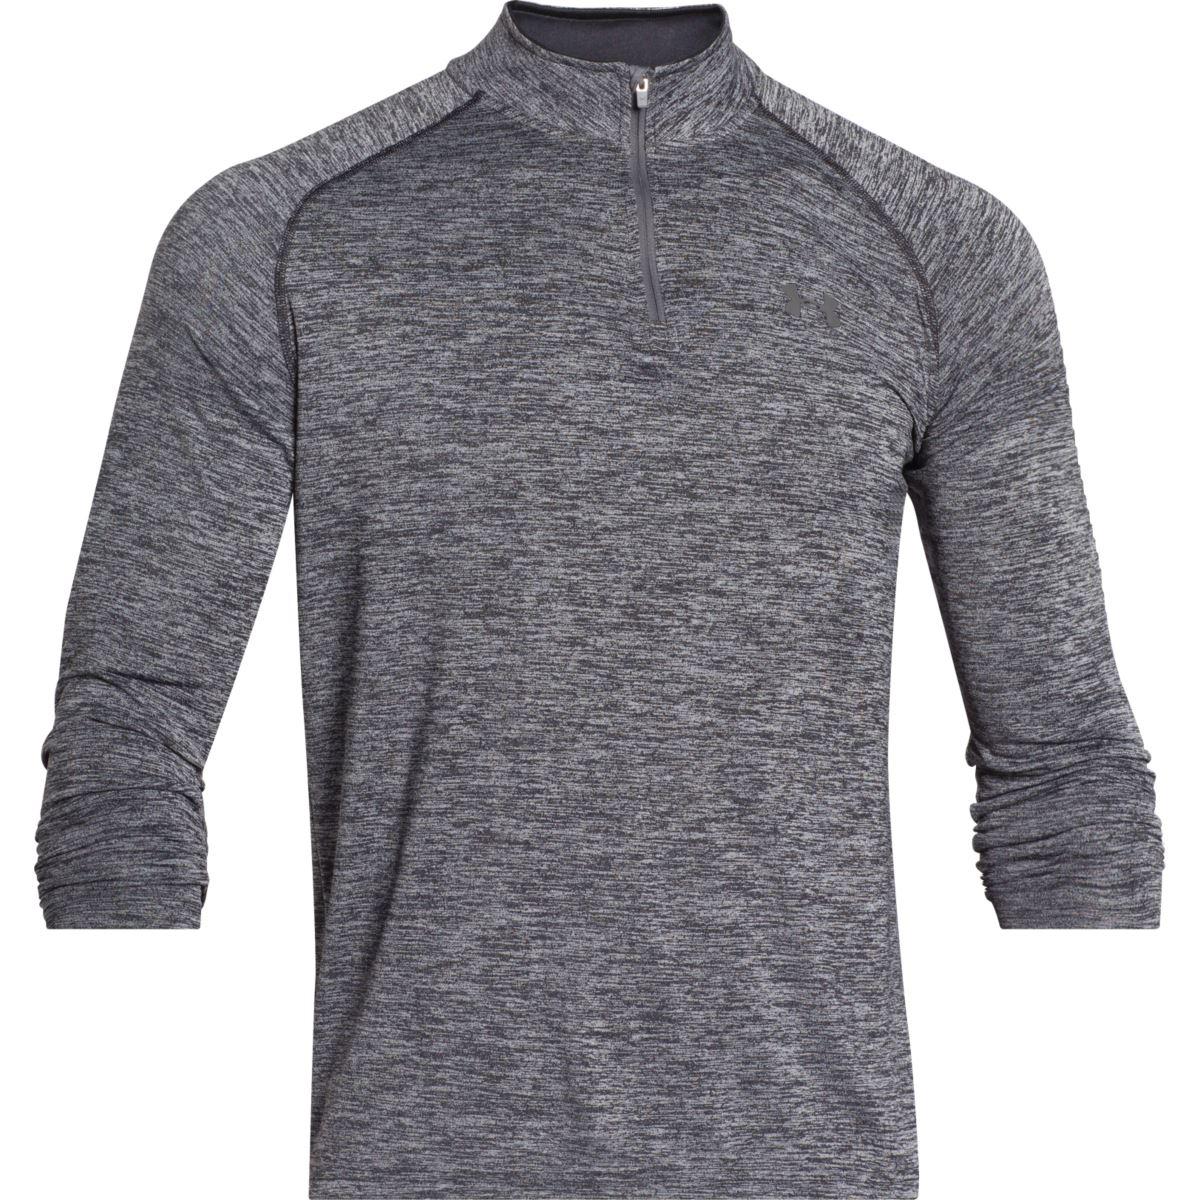 Under-Armour-AW-2018-UA-Mens-Cover-Up-LS-Sports-Shirt-Gym-Top-T-Shirt